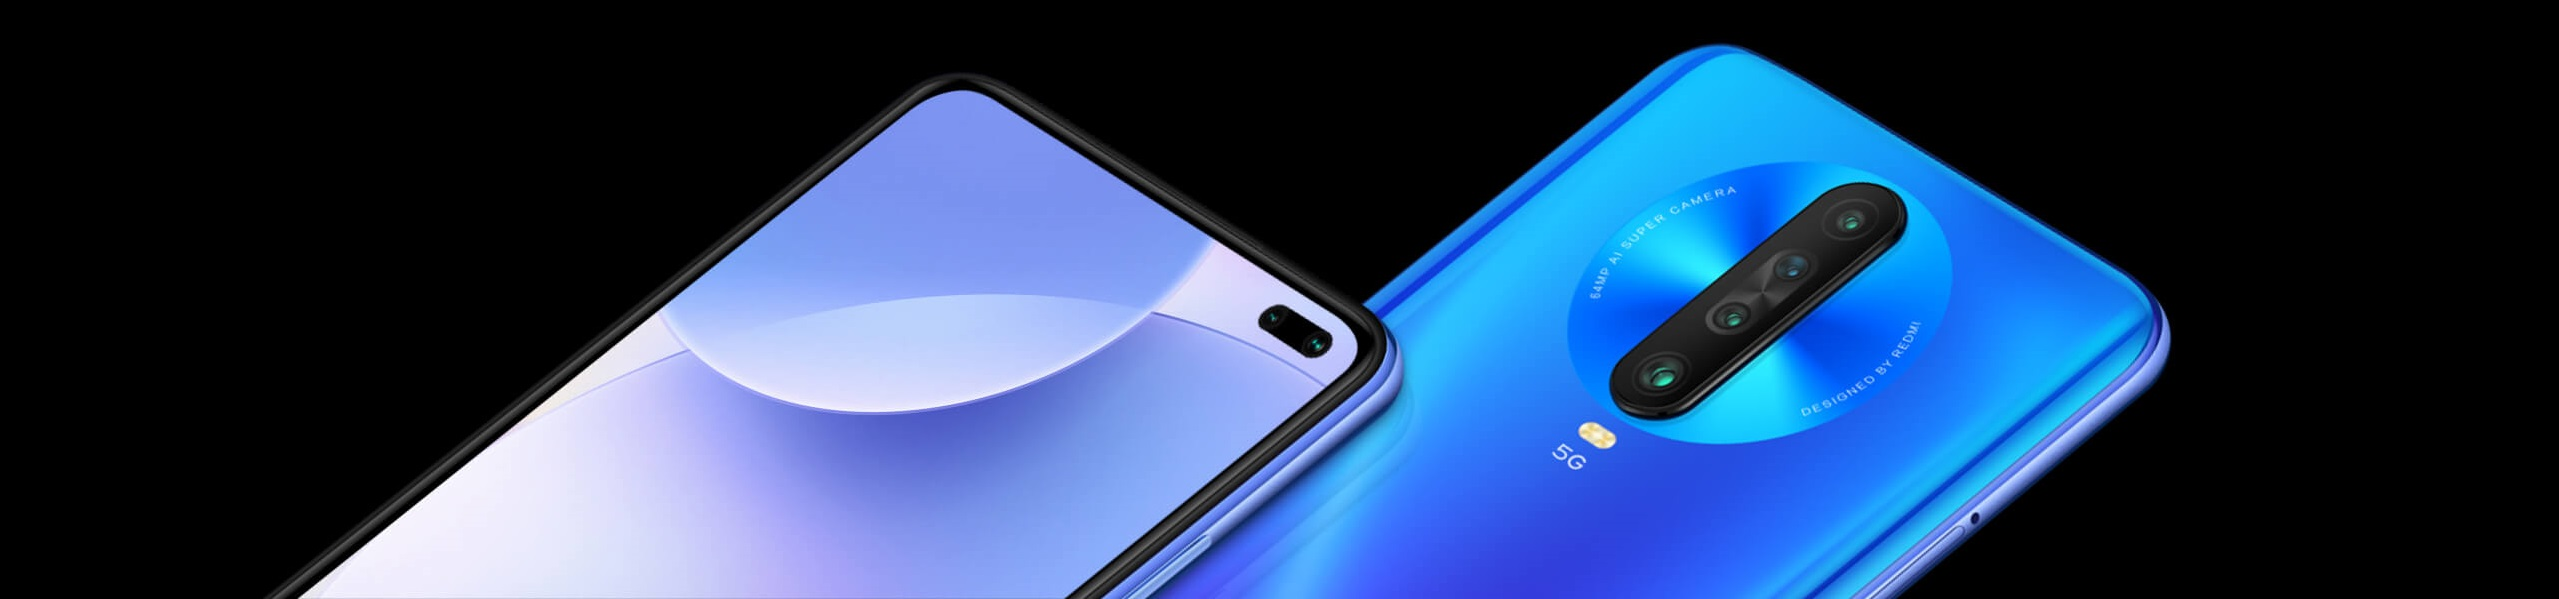 Redmi K30 5G smartphone